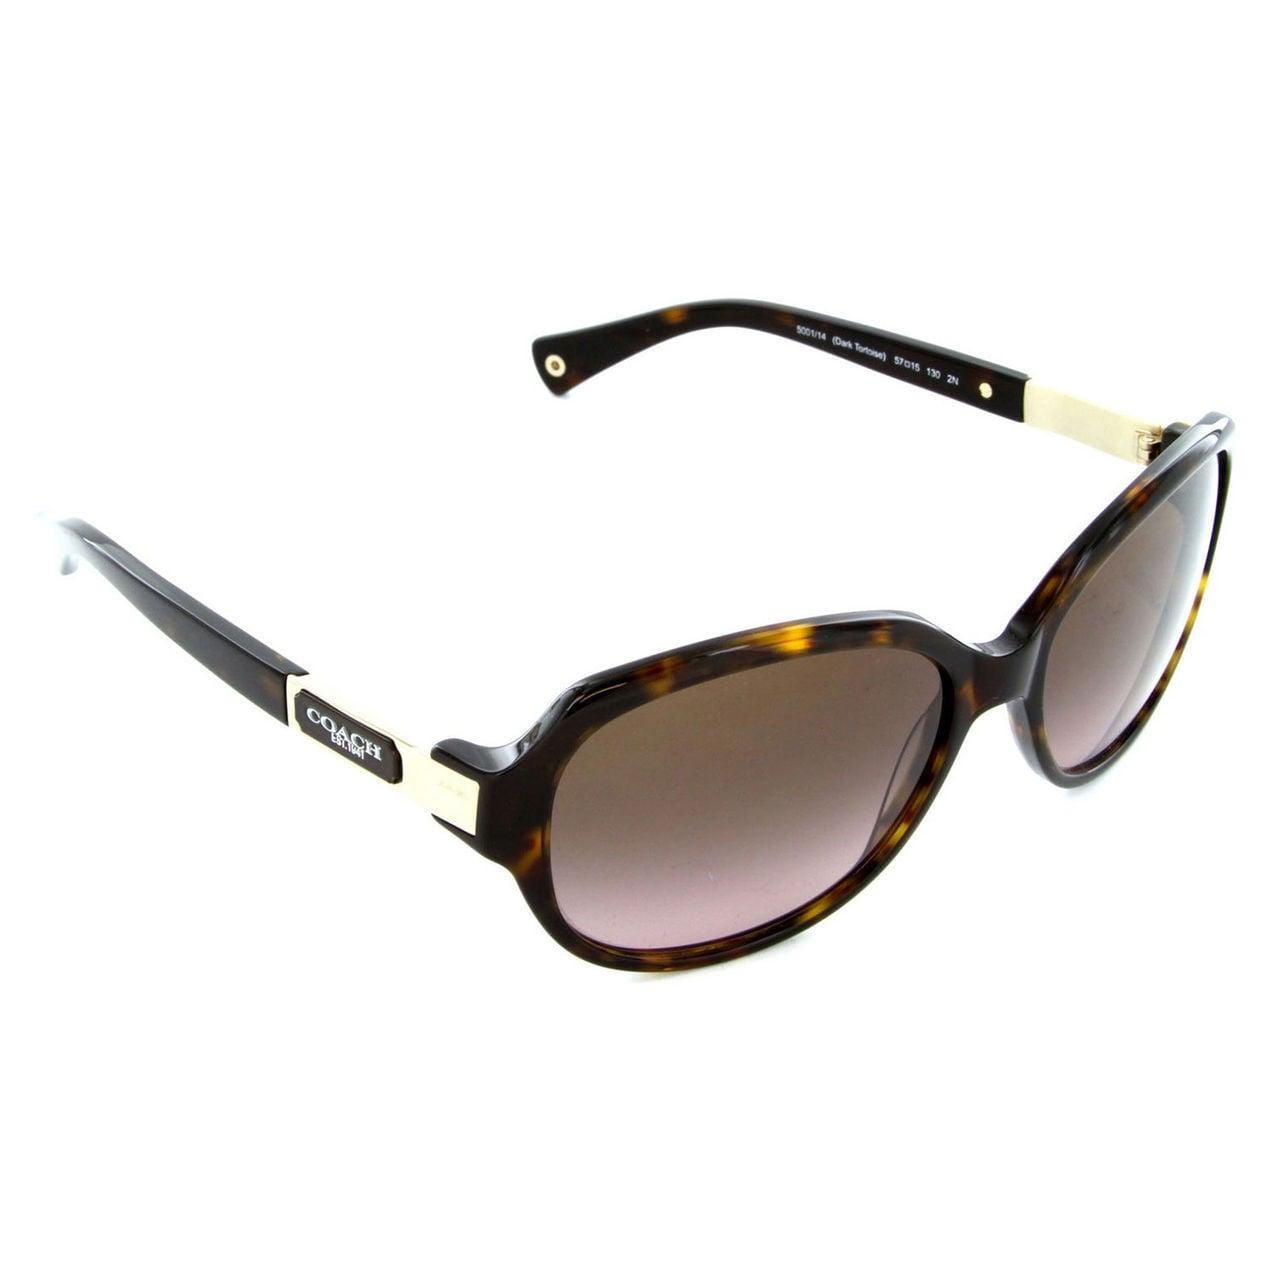 e25f1ef6df3 Shop Coach Women s HC8039 L039 Annette 500114 Sunglasses - Tortoise - Free  Shipping Today - Overstock.com - 10324944